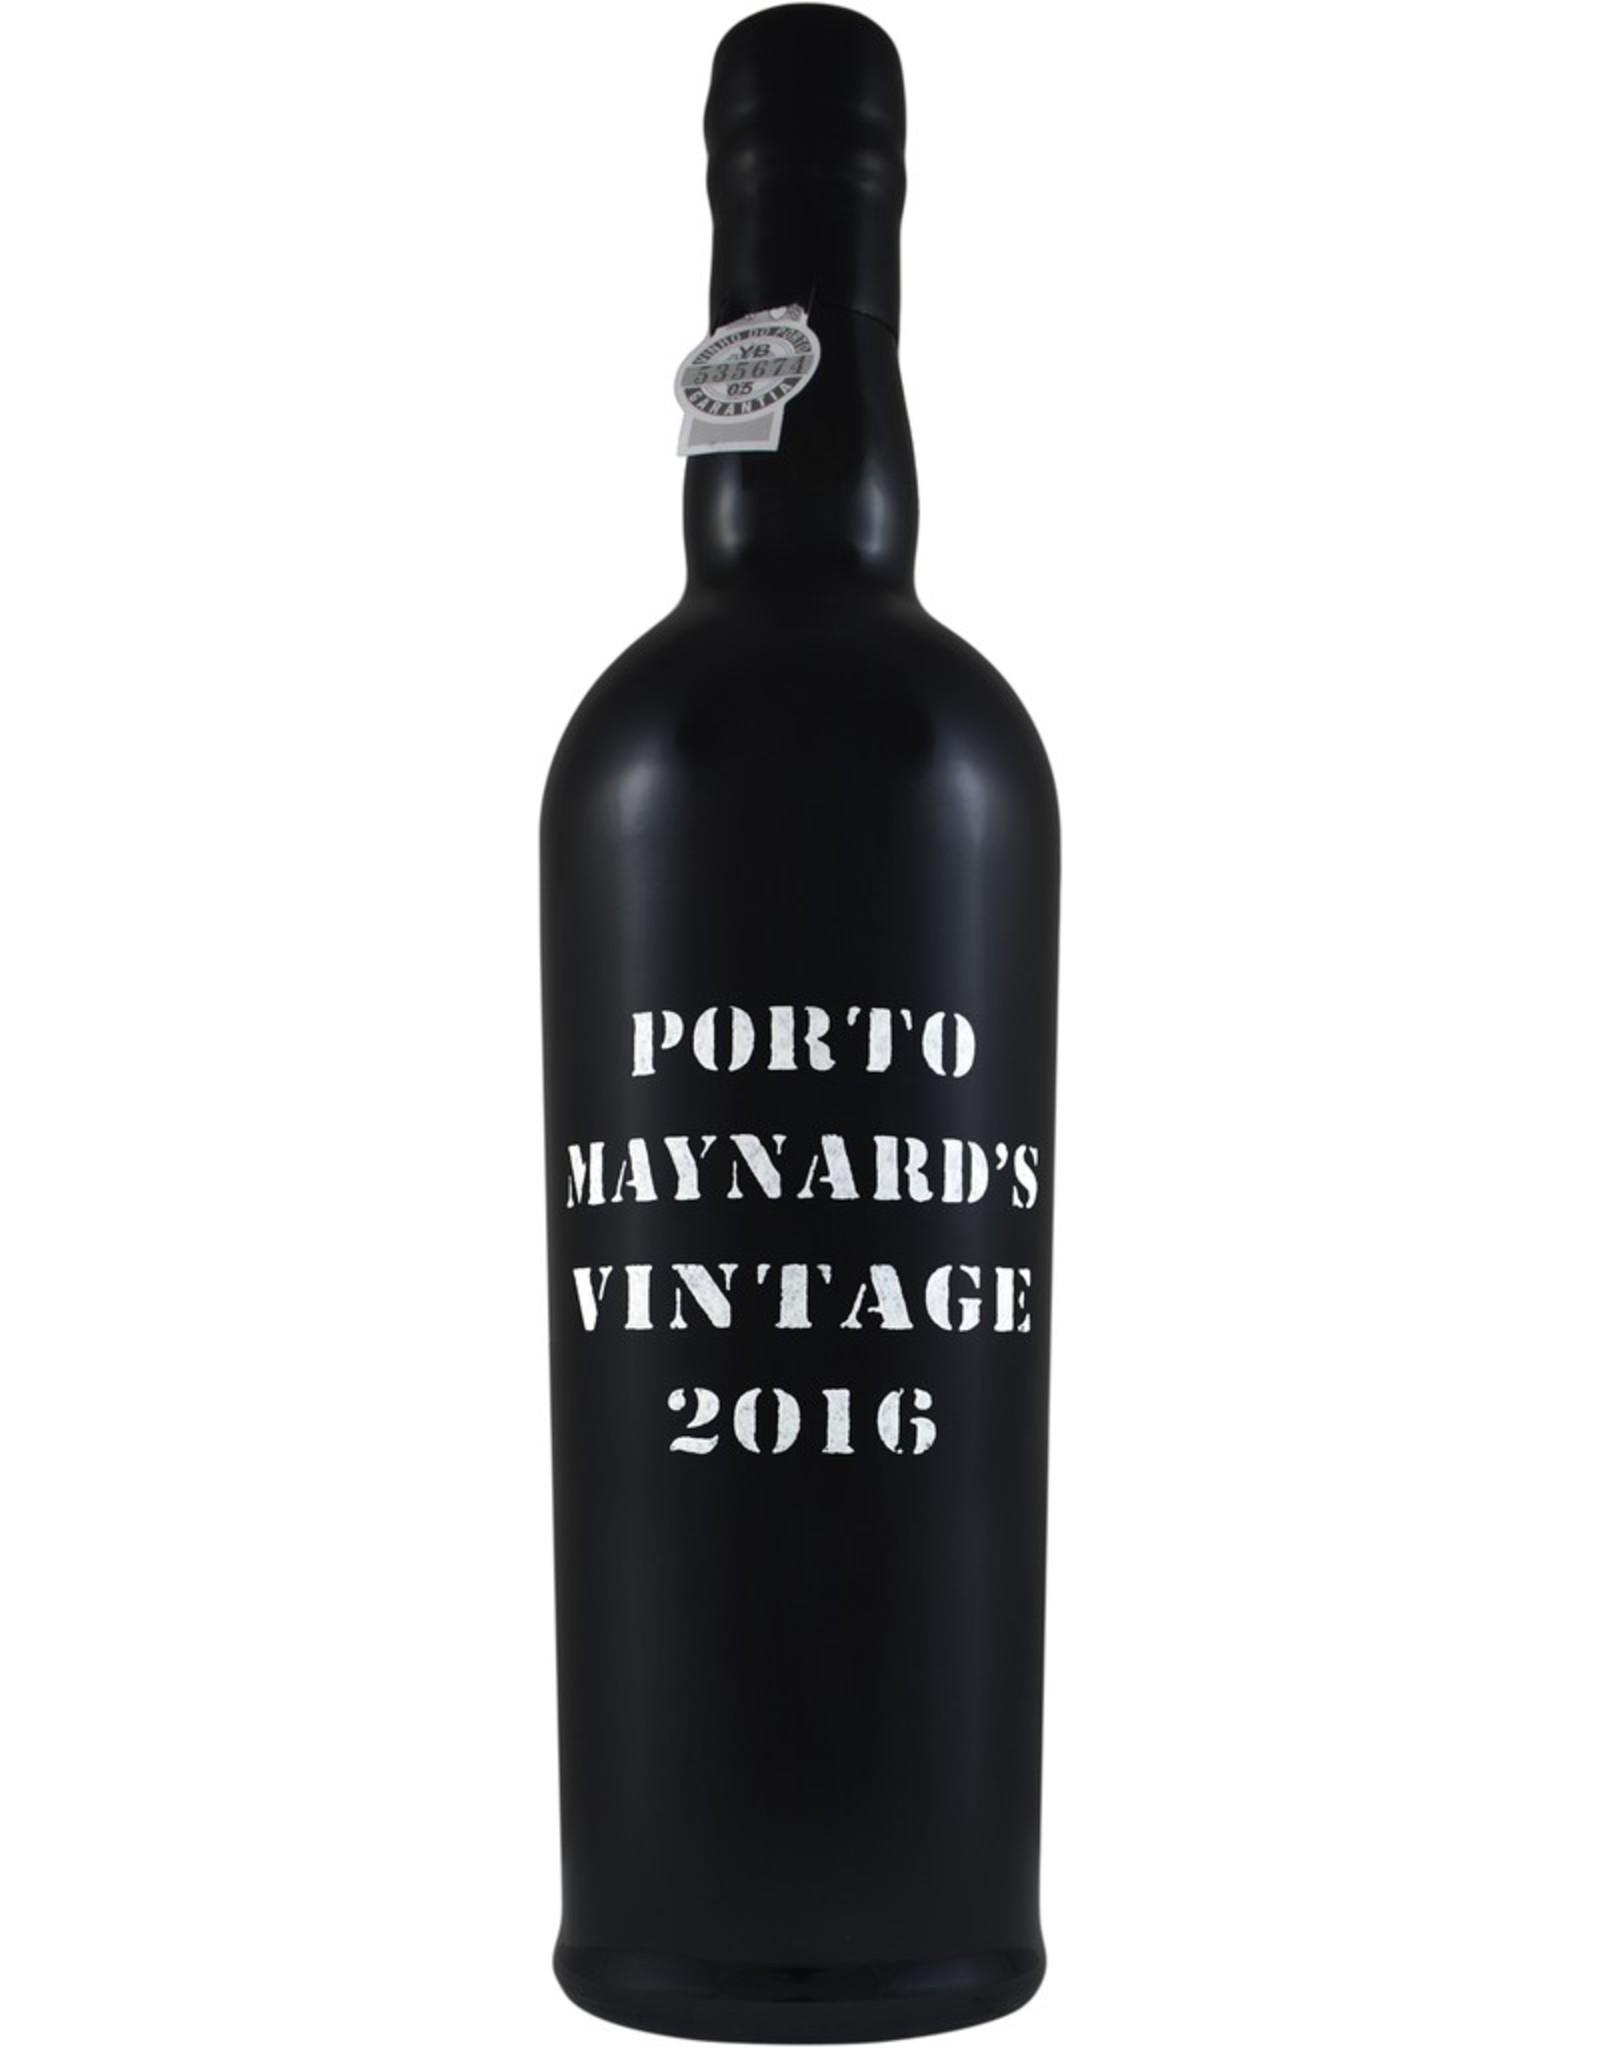 Port 2016, Maynard's Vintage Porto Port, Port, Douro Valley, Oporto, Portugal, 20% Alc, CTnr WE99